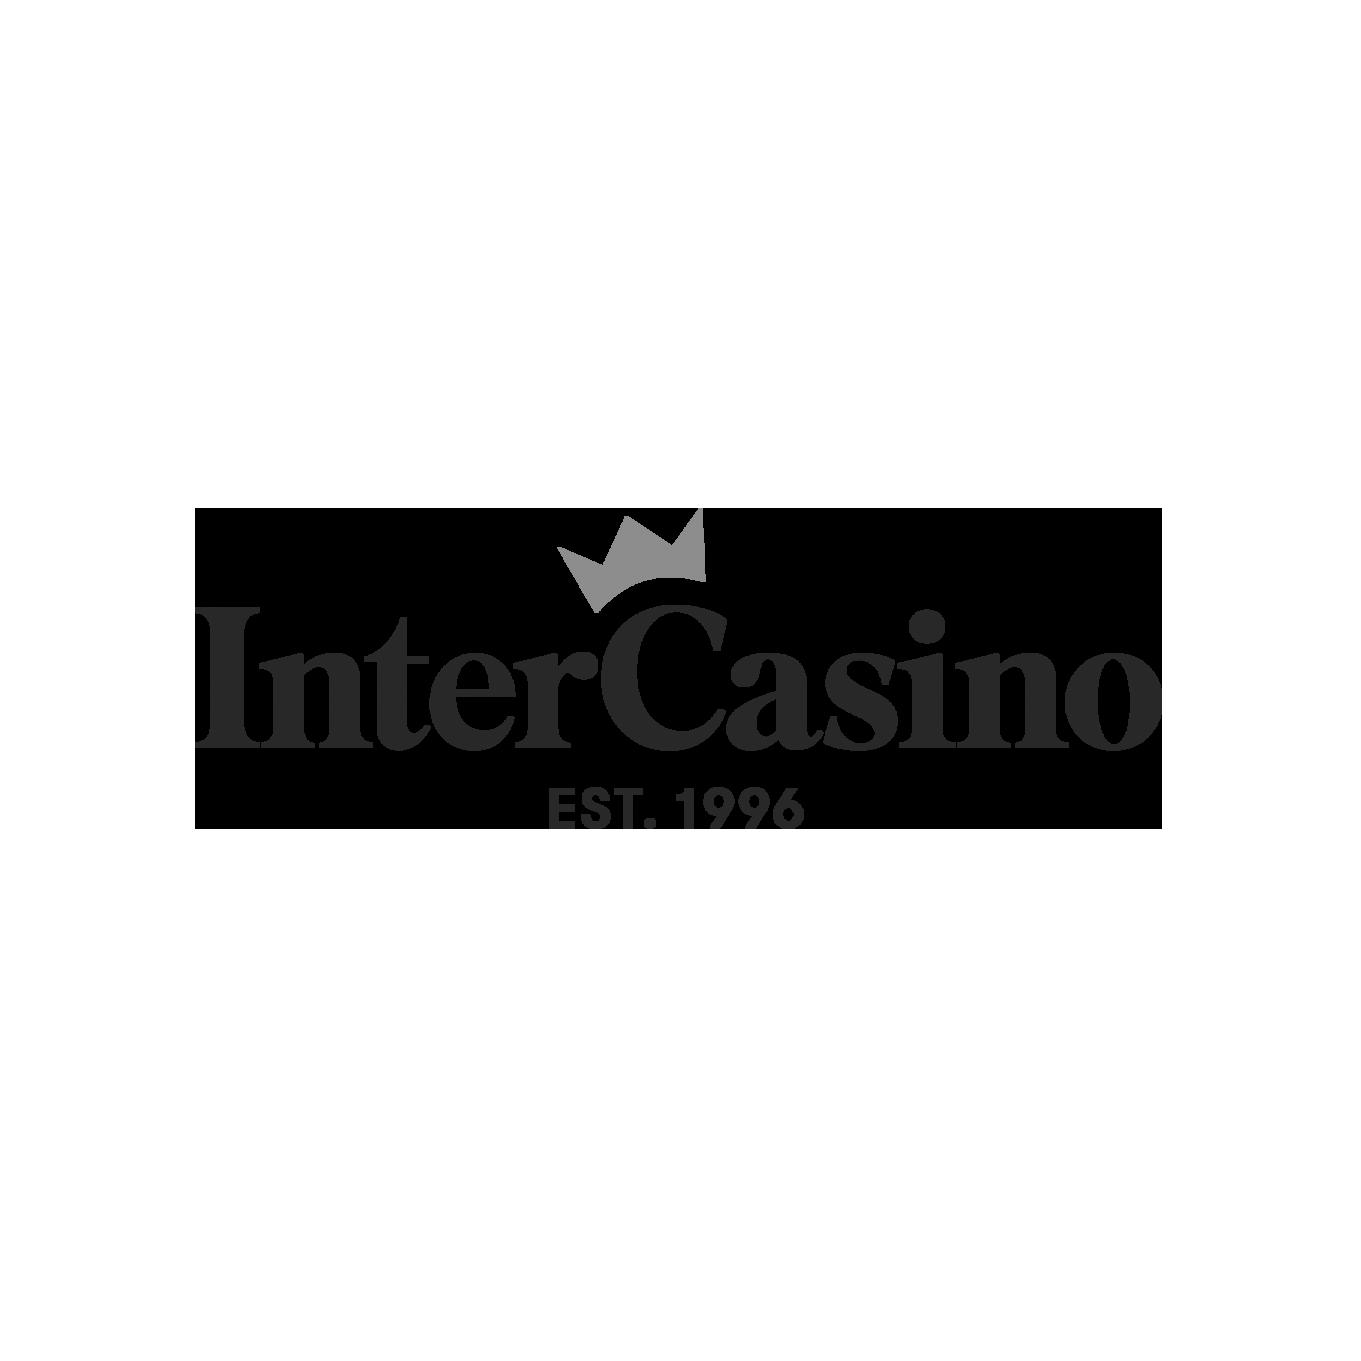 Intercasino-BW.png